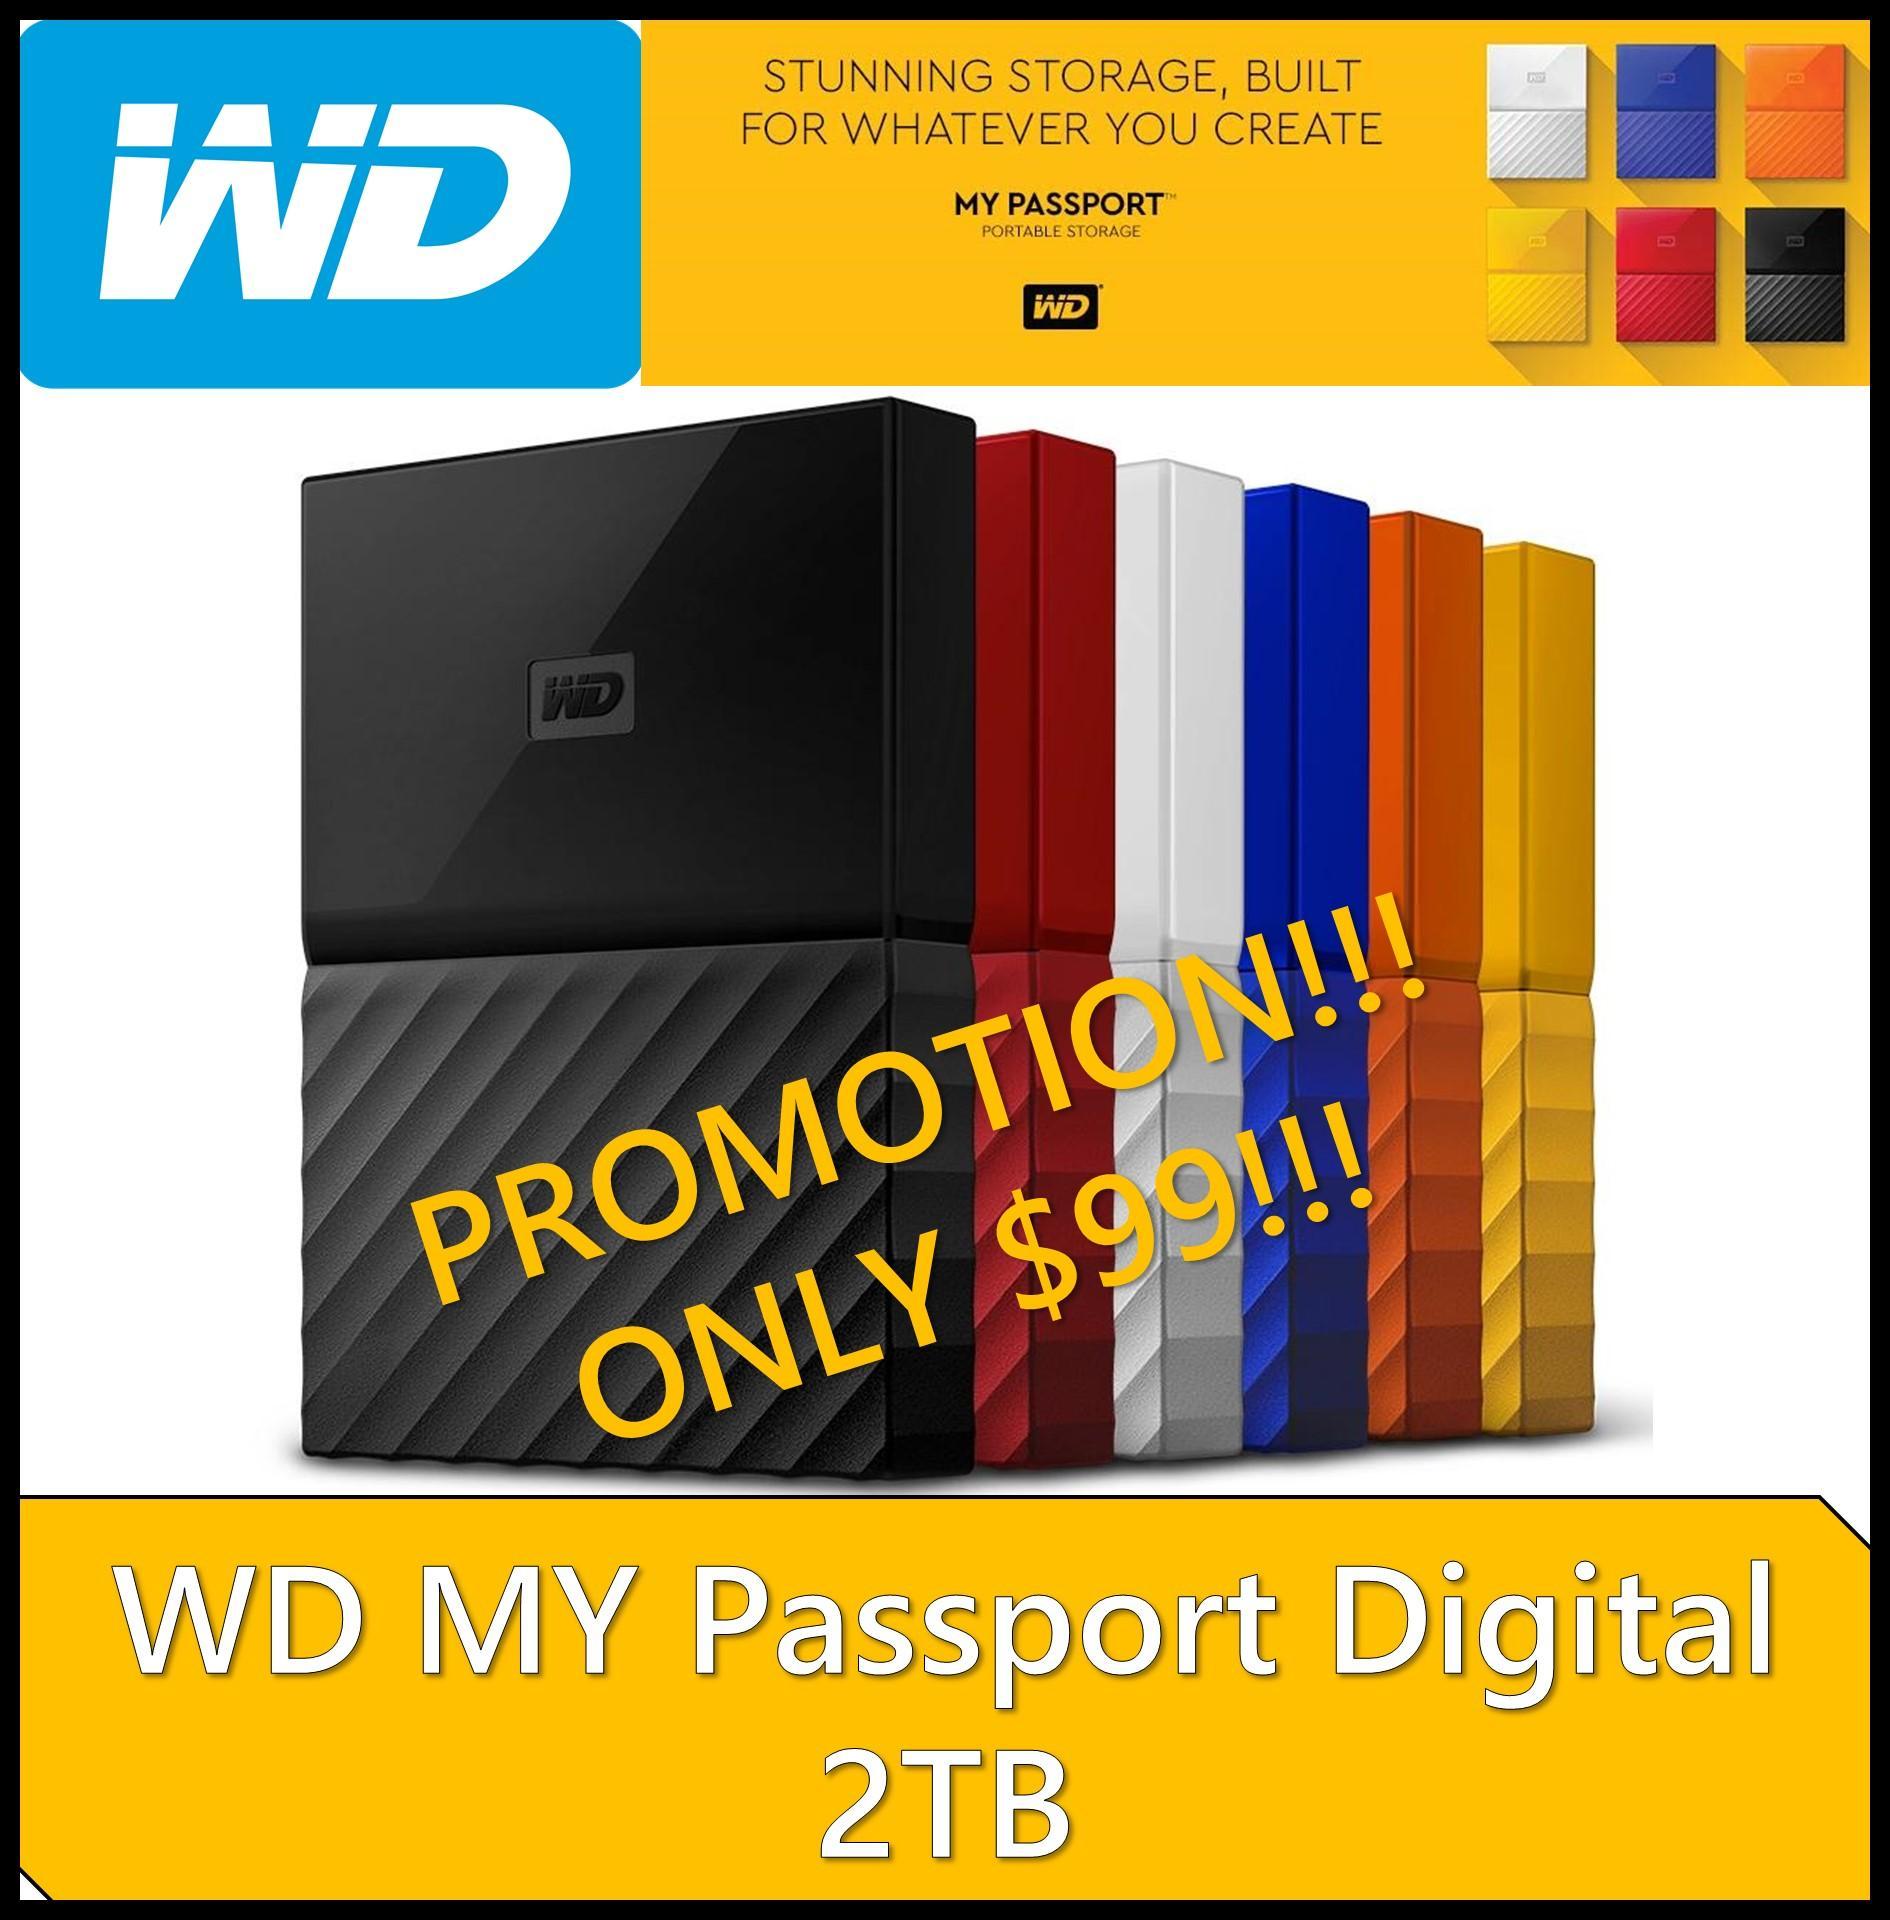 Tempat Jual Wd My Passport Ultra Portable Storage Hard Disk Police 14544jsb 02 Merah Buy External Drives Online Xooes Eksternal Black Grey